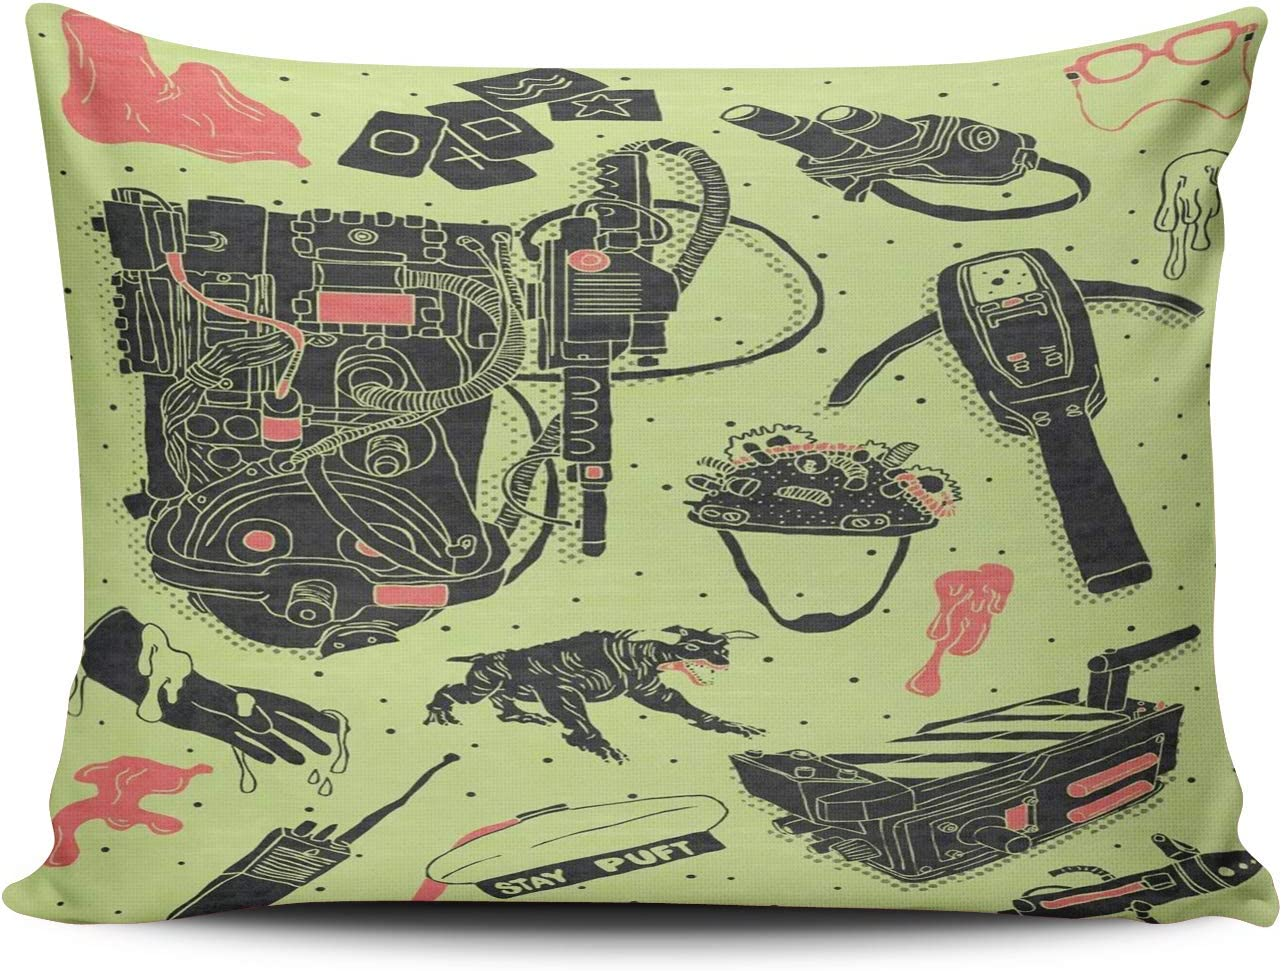 MUKPU Home Custom Decor Ghostbusters Equipment Pillowcase Breathable Throw Pillow Case Hidden Zipper One Side Design Print Standard 20x26 Inches